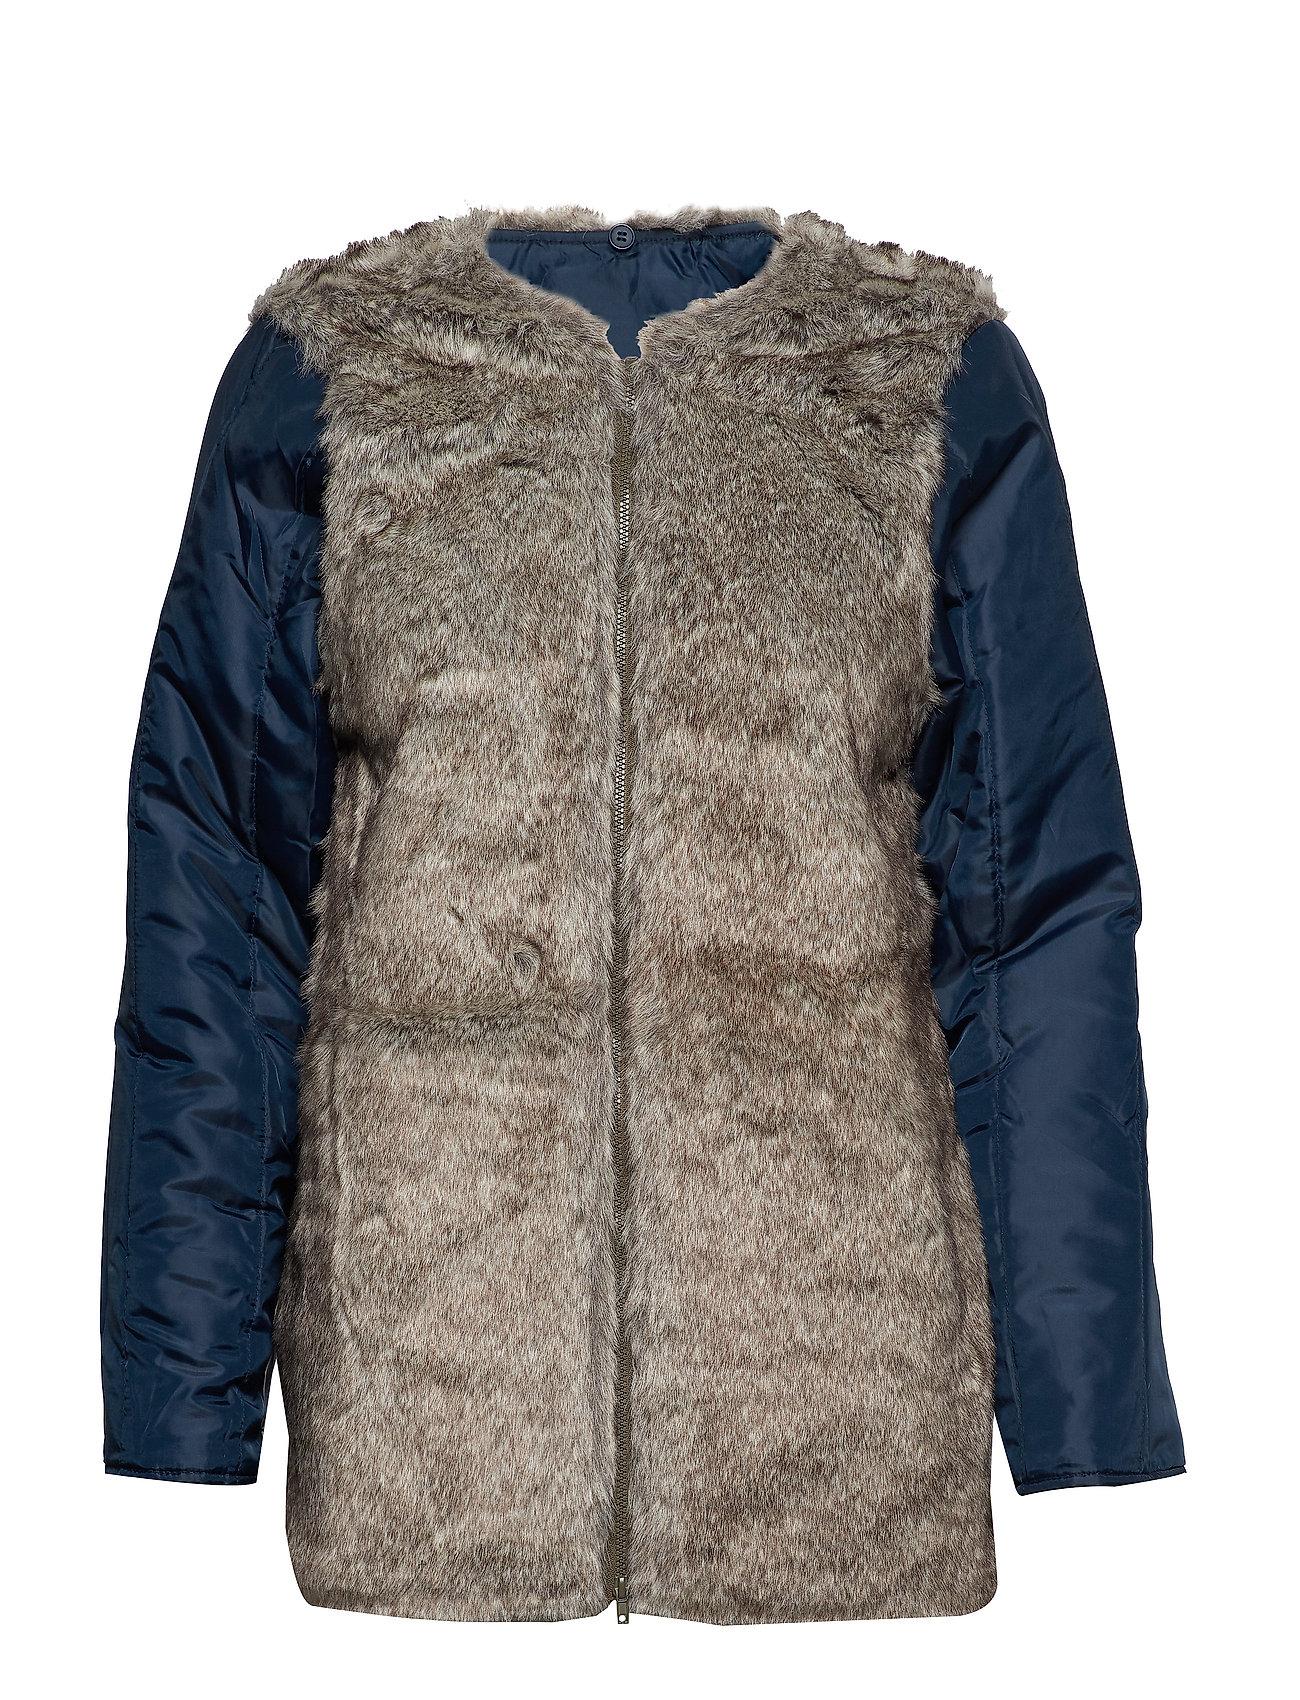 GreenEsprit Coats Wovenkhaki Wovenkhaki GreenEsprit Coats Casual 80wkXPOn